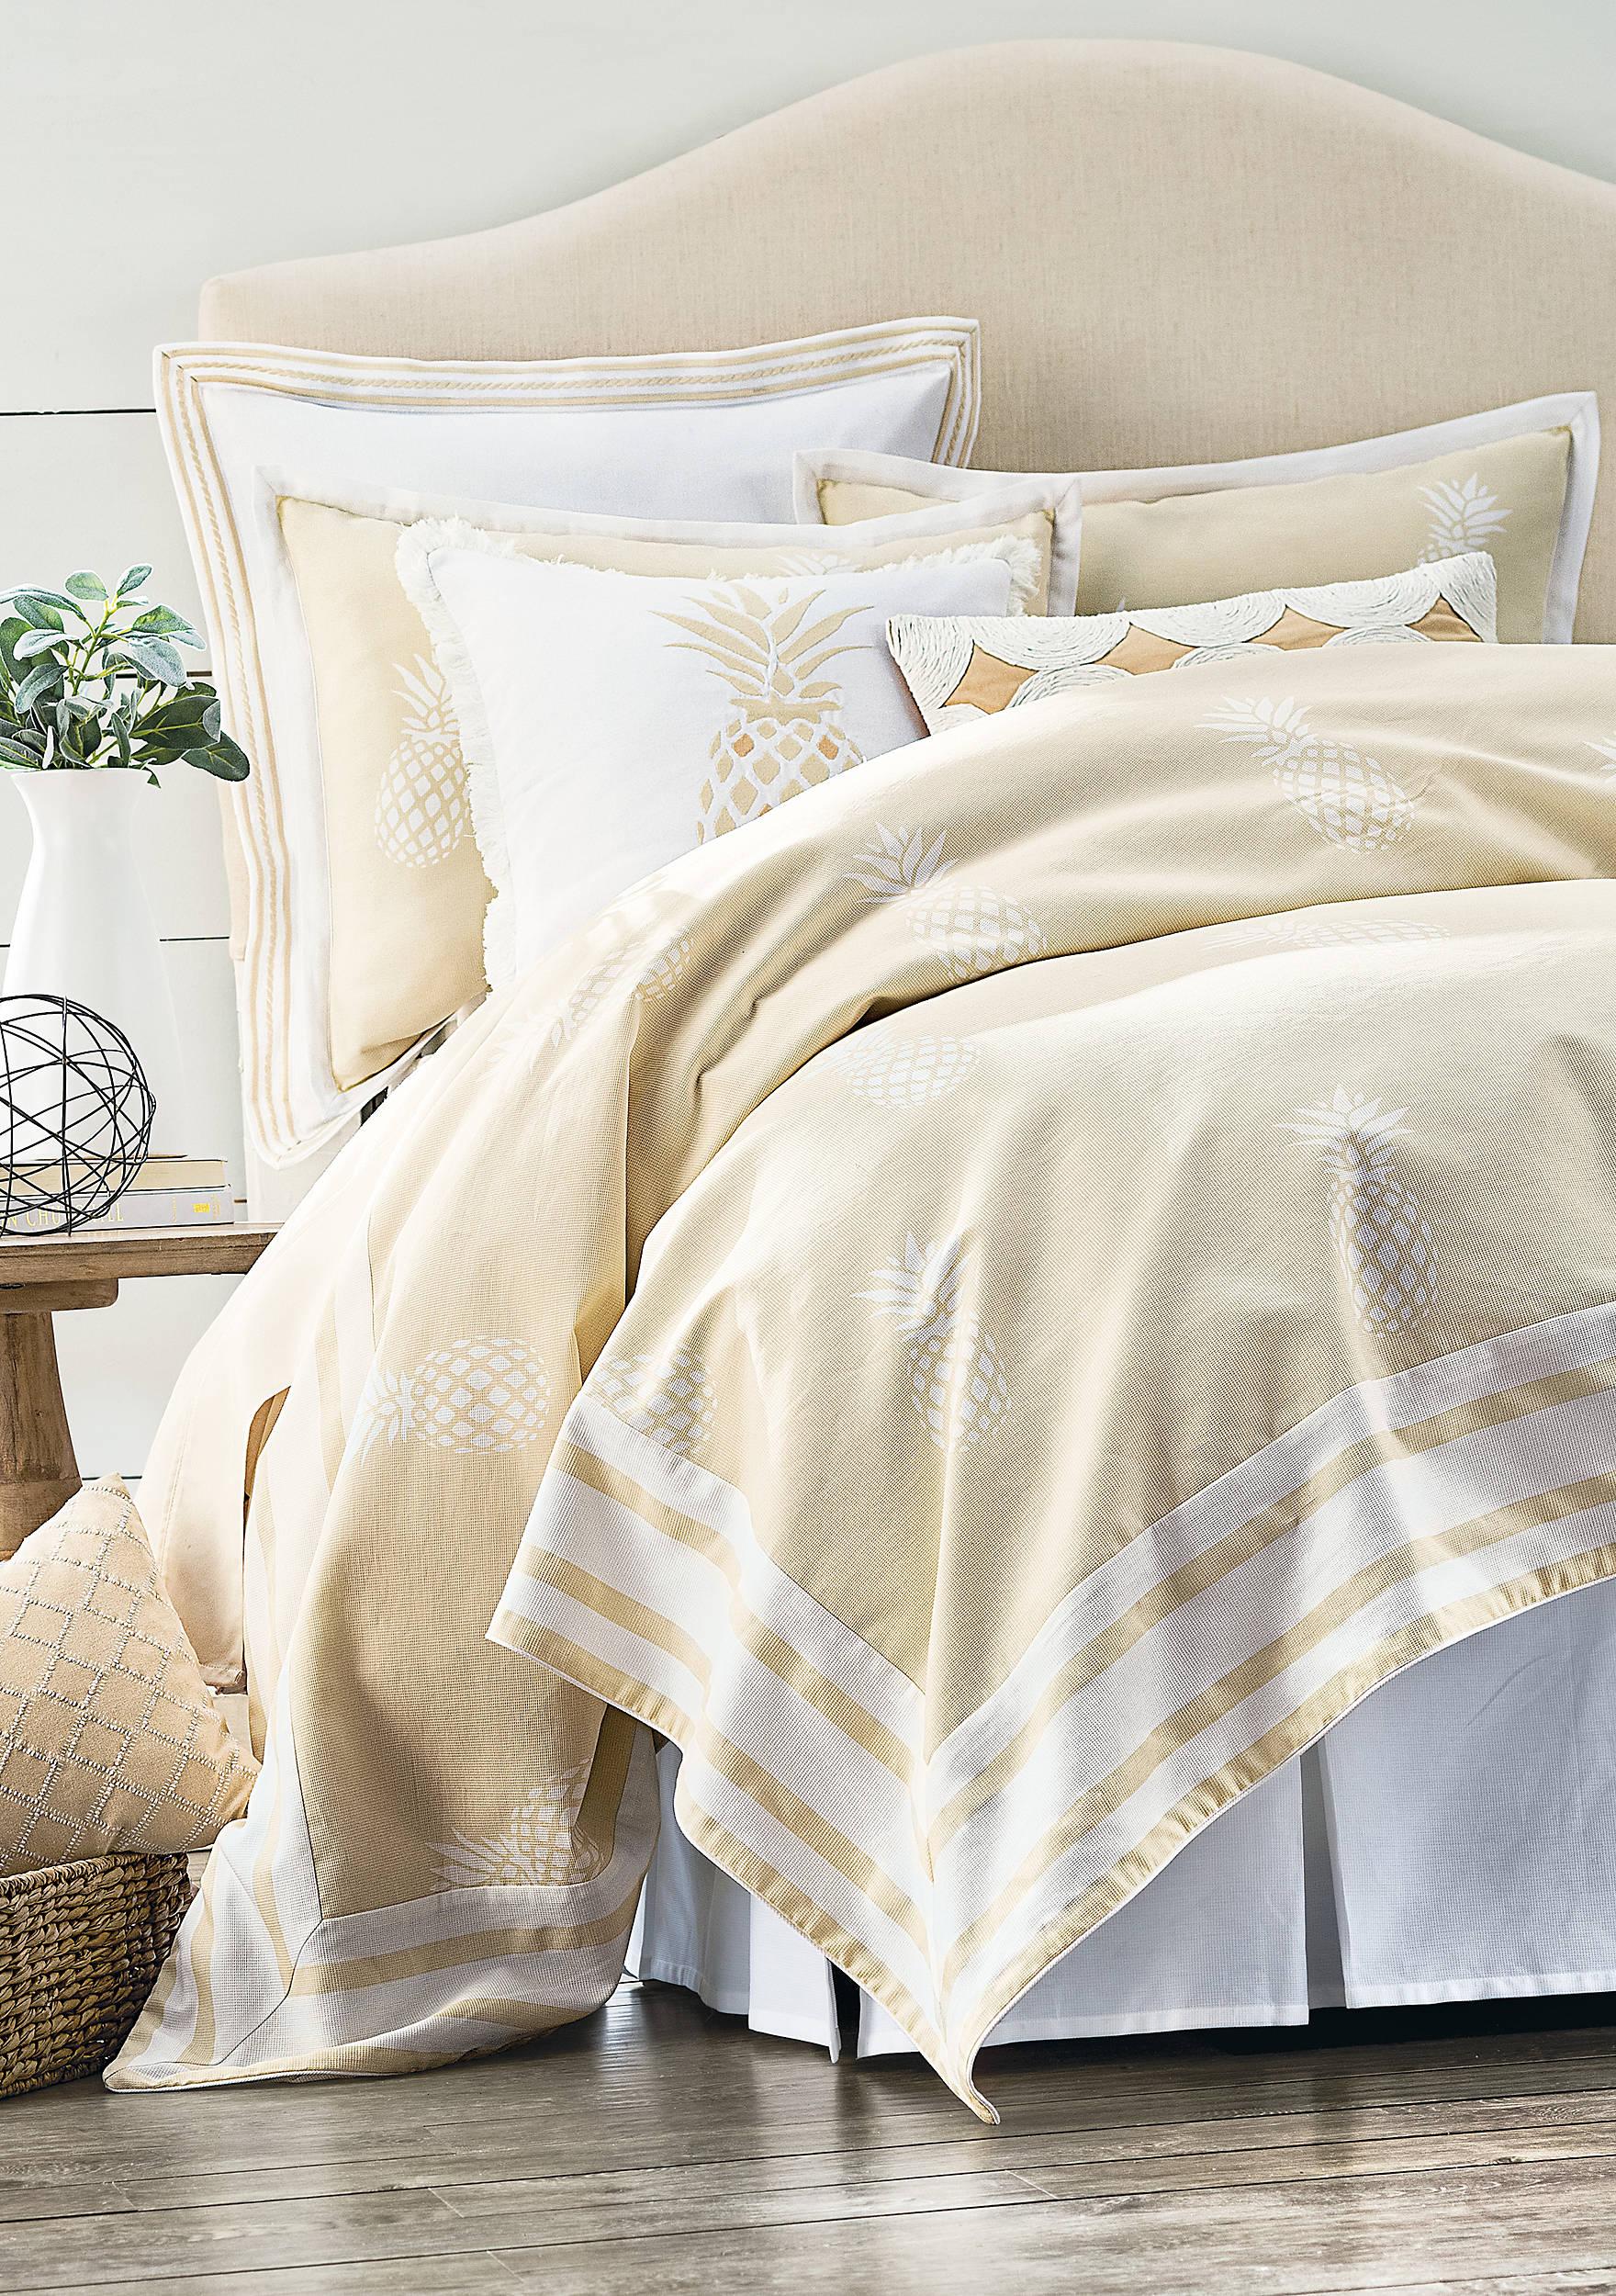 comforter duvet sheets polka bedspread dragonfly stripe southern tide tile sets candy comforters bow dot top dorm super bedding spade marvelous clearance covers king set cover kate navy twin